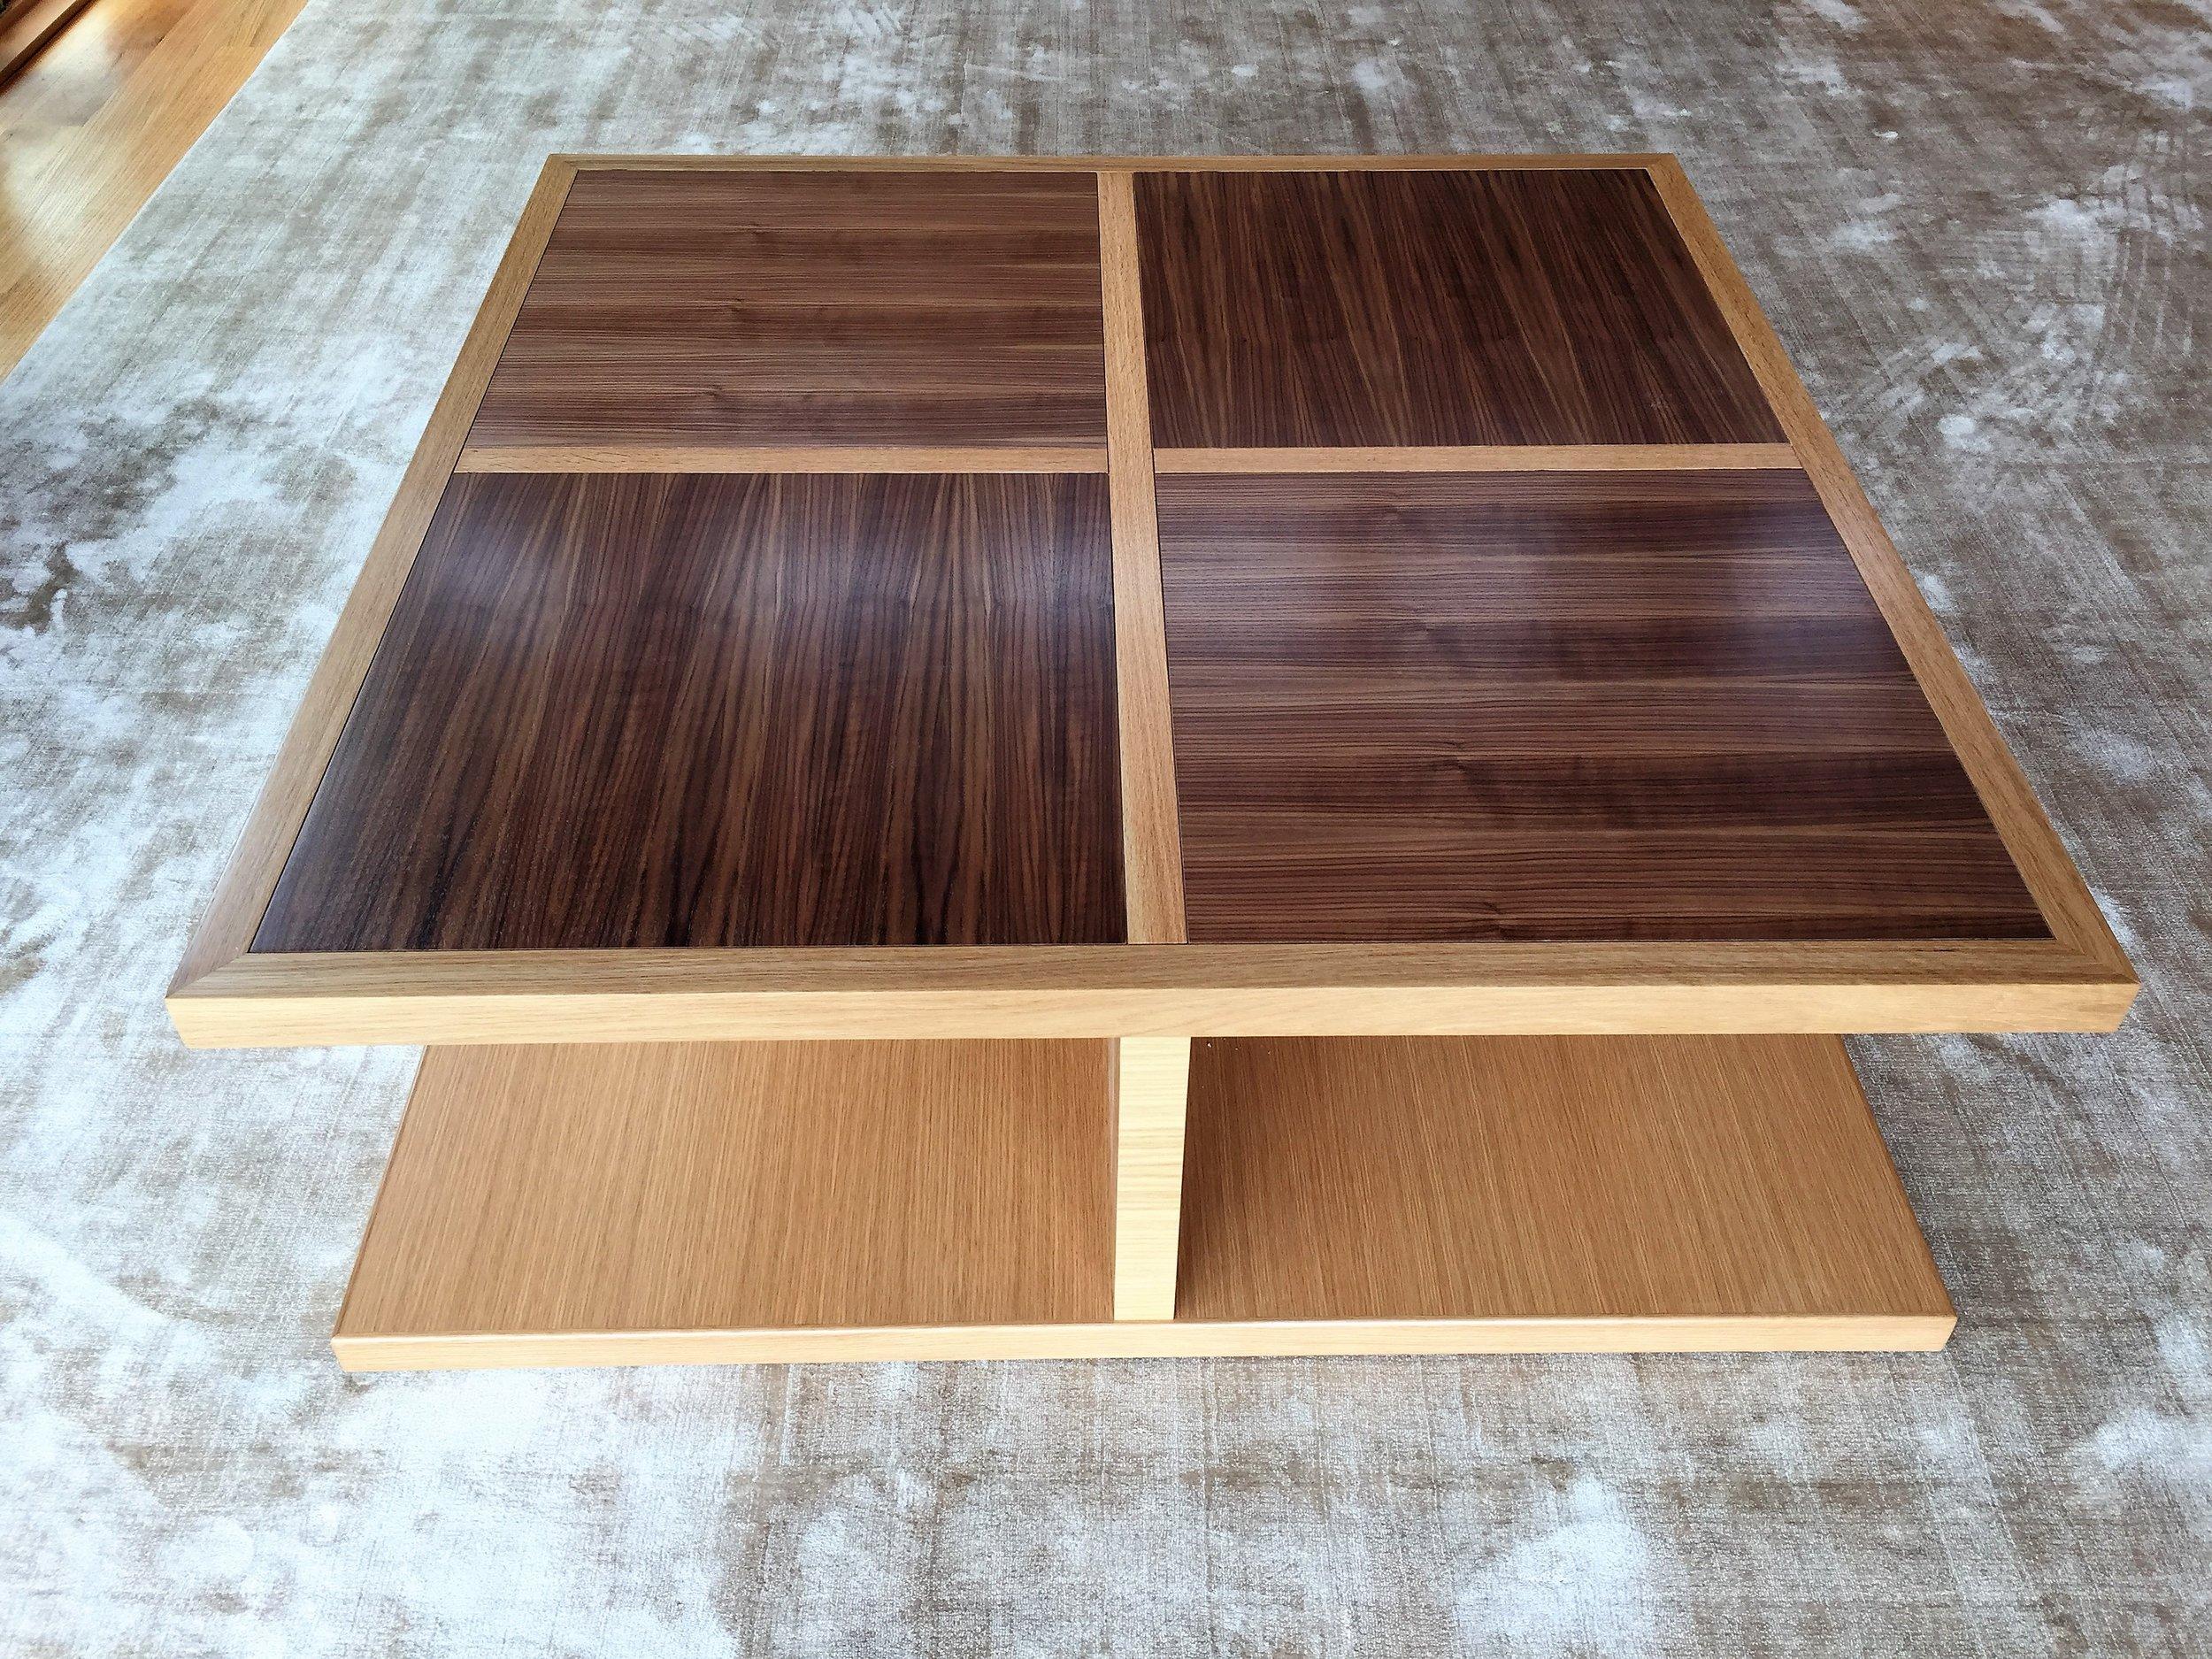 White oak and rift walnut coffee table.